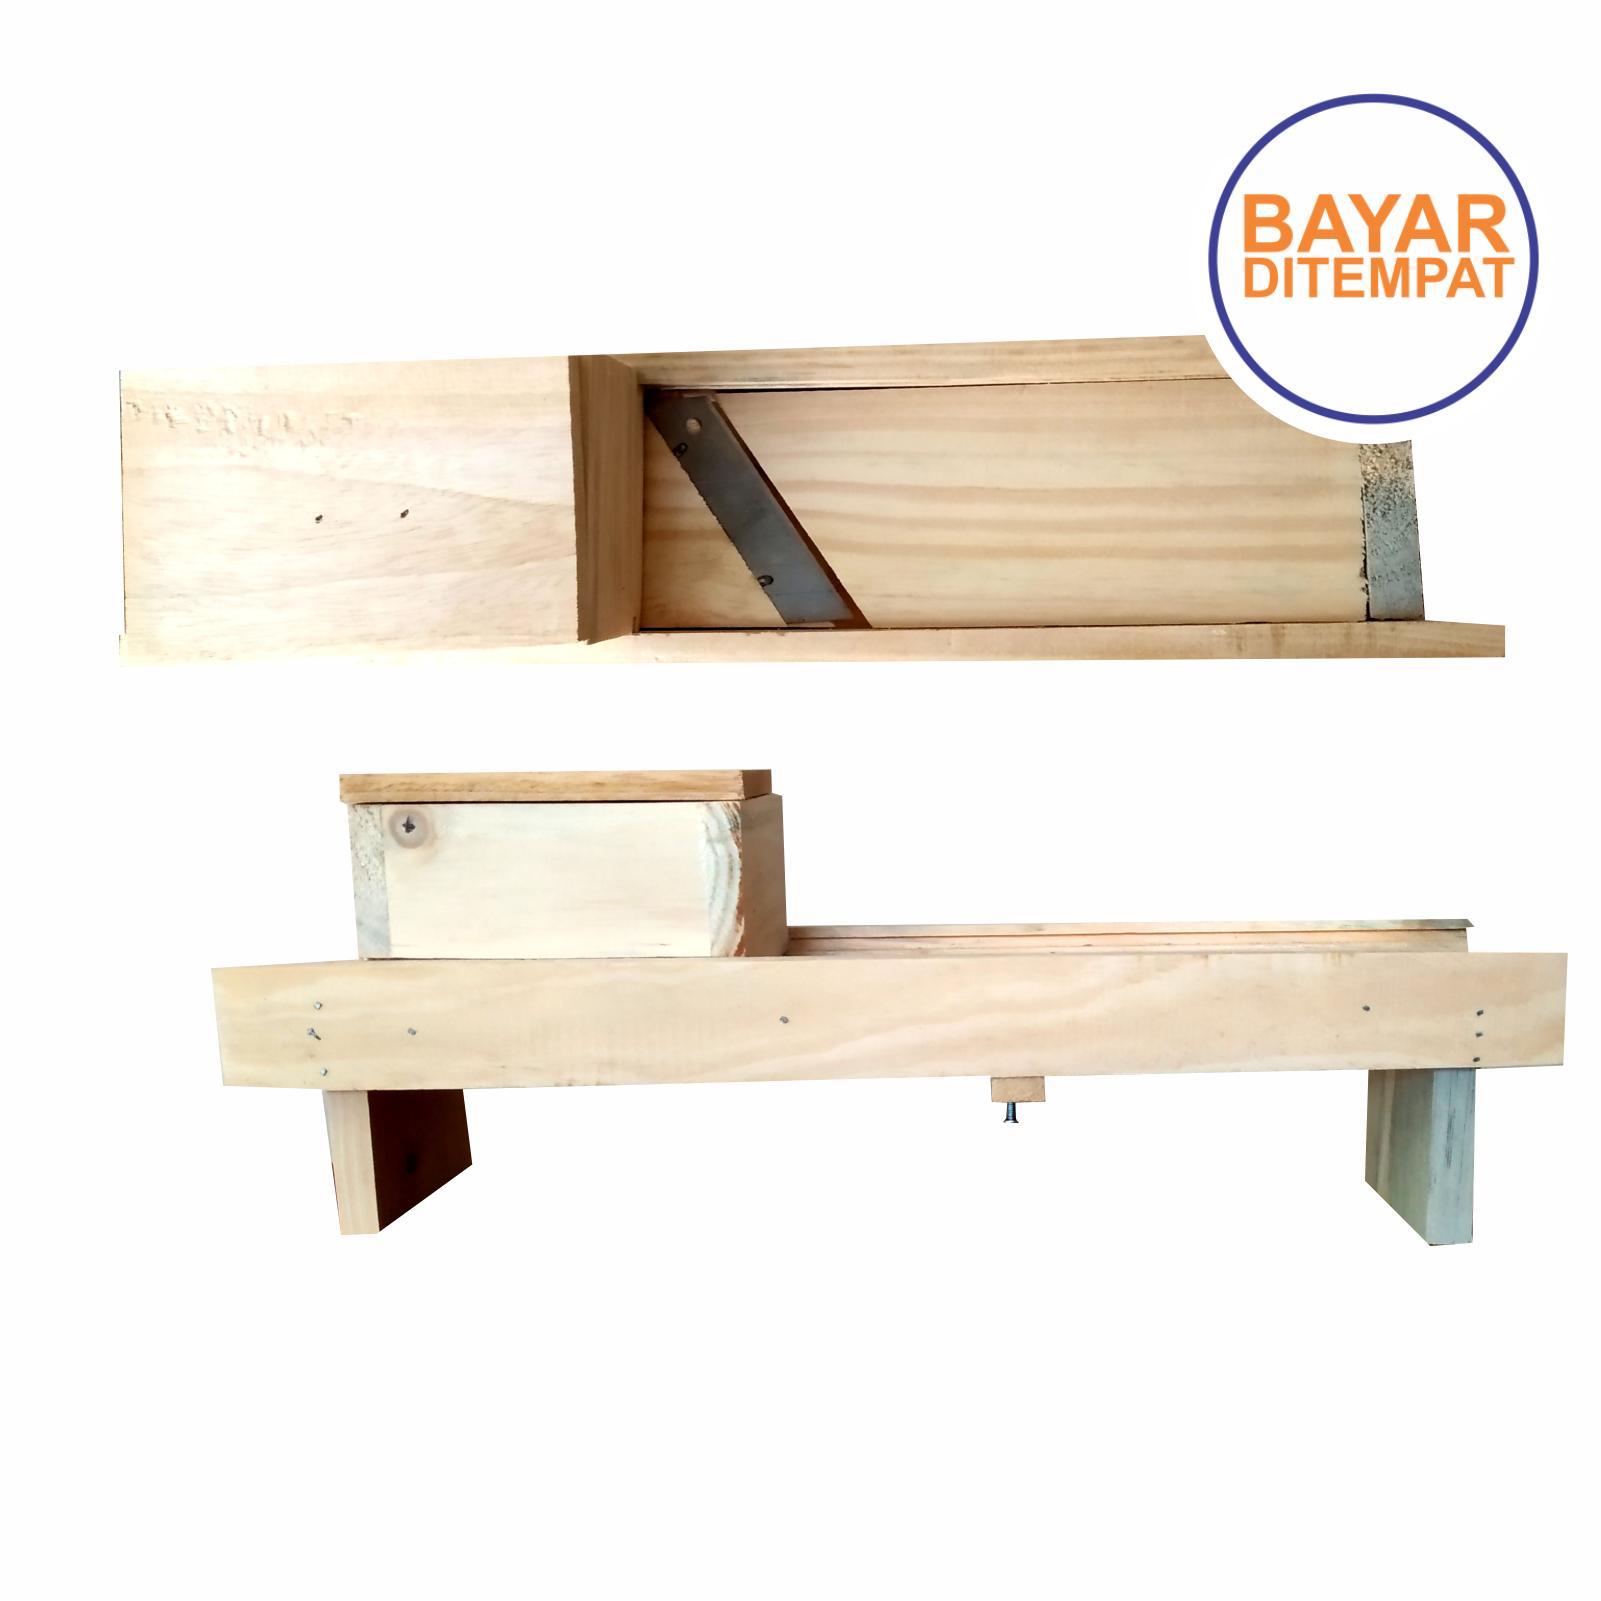 bayar ditempat alat pasah brambang  alat potong tempe alat buat kripik alat pasah bawang kayu  ukuran besar tanggung